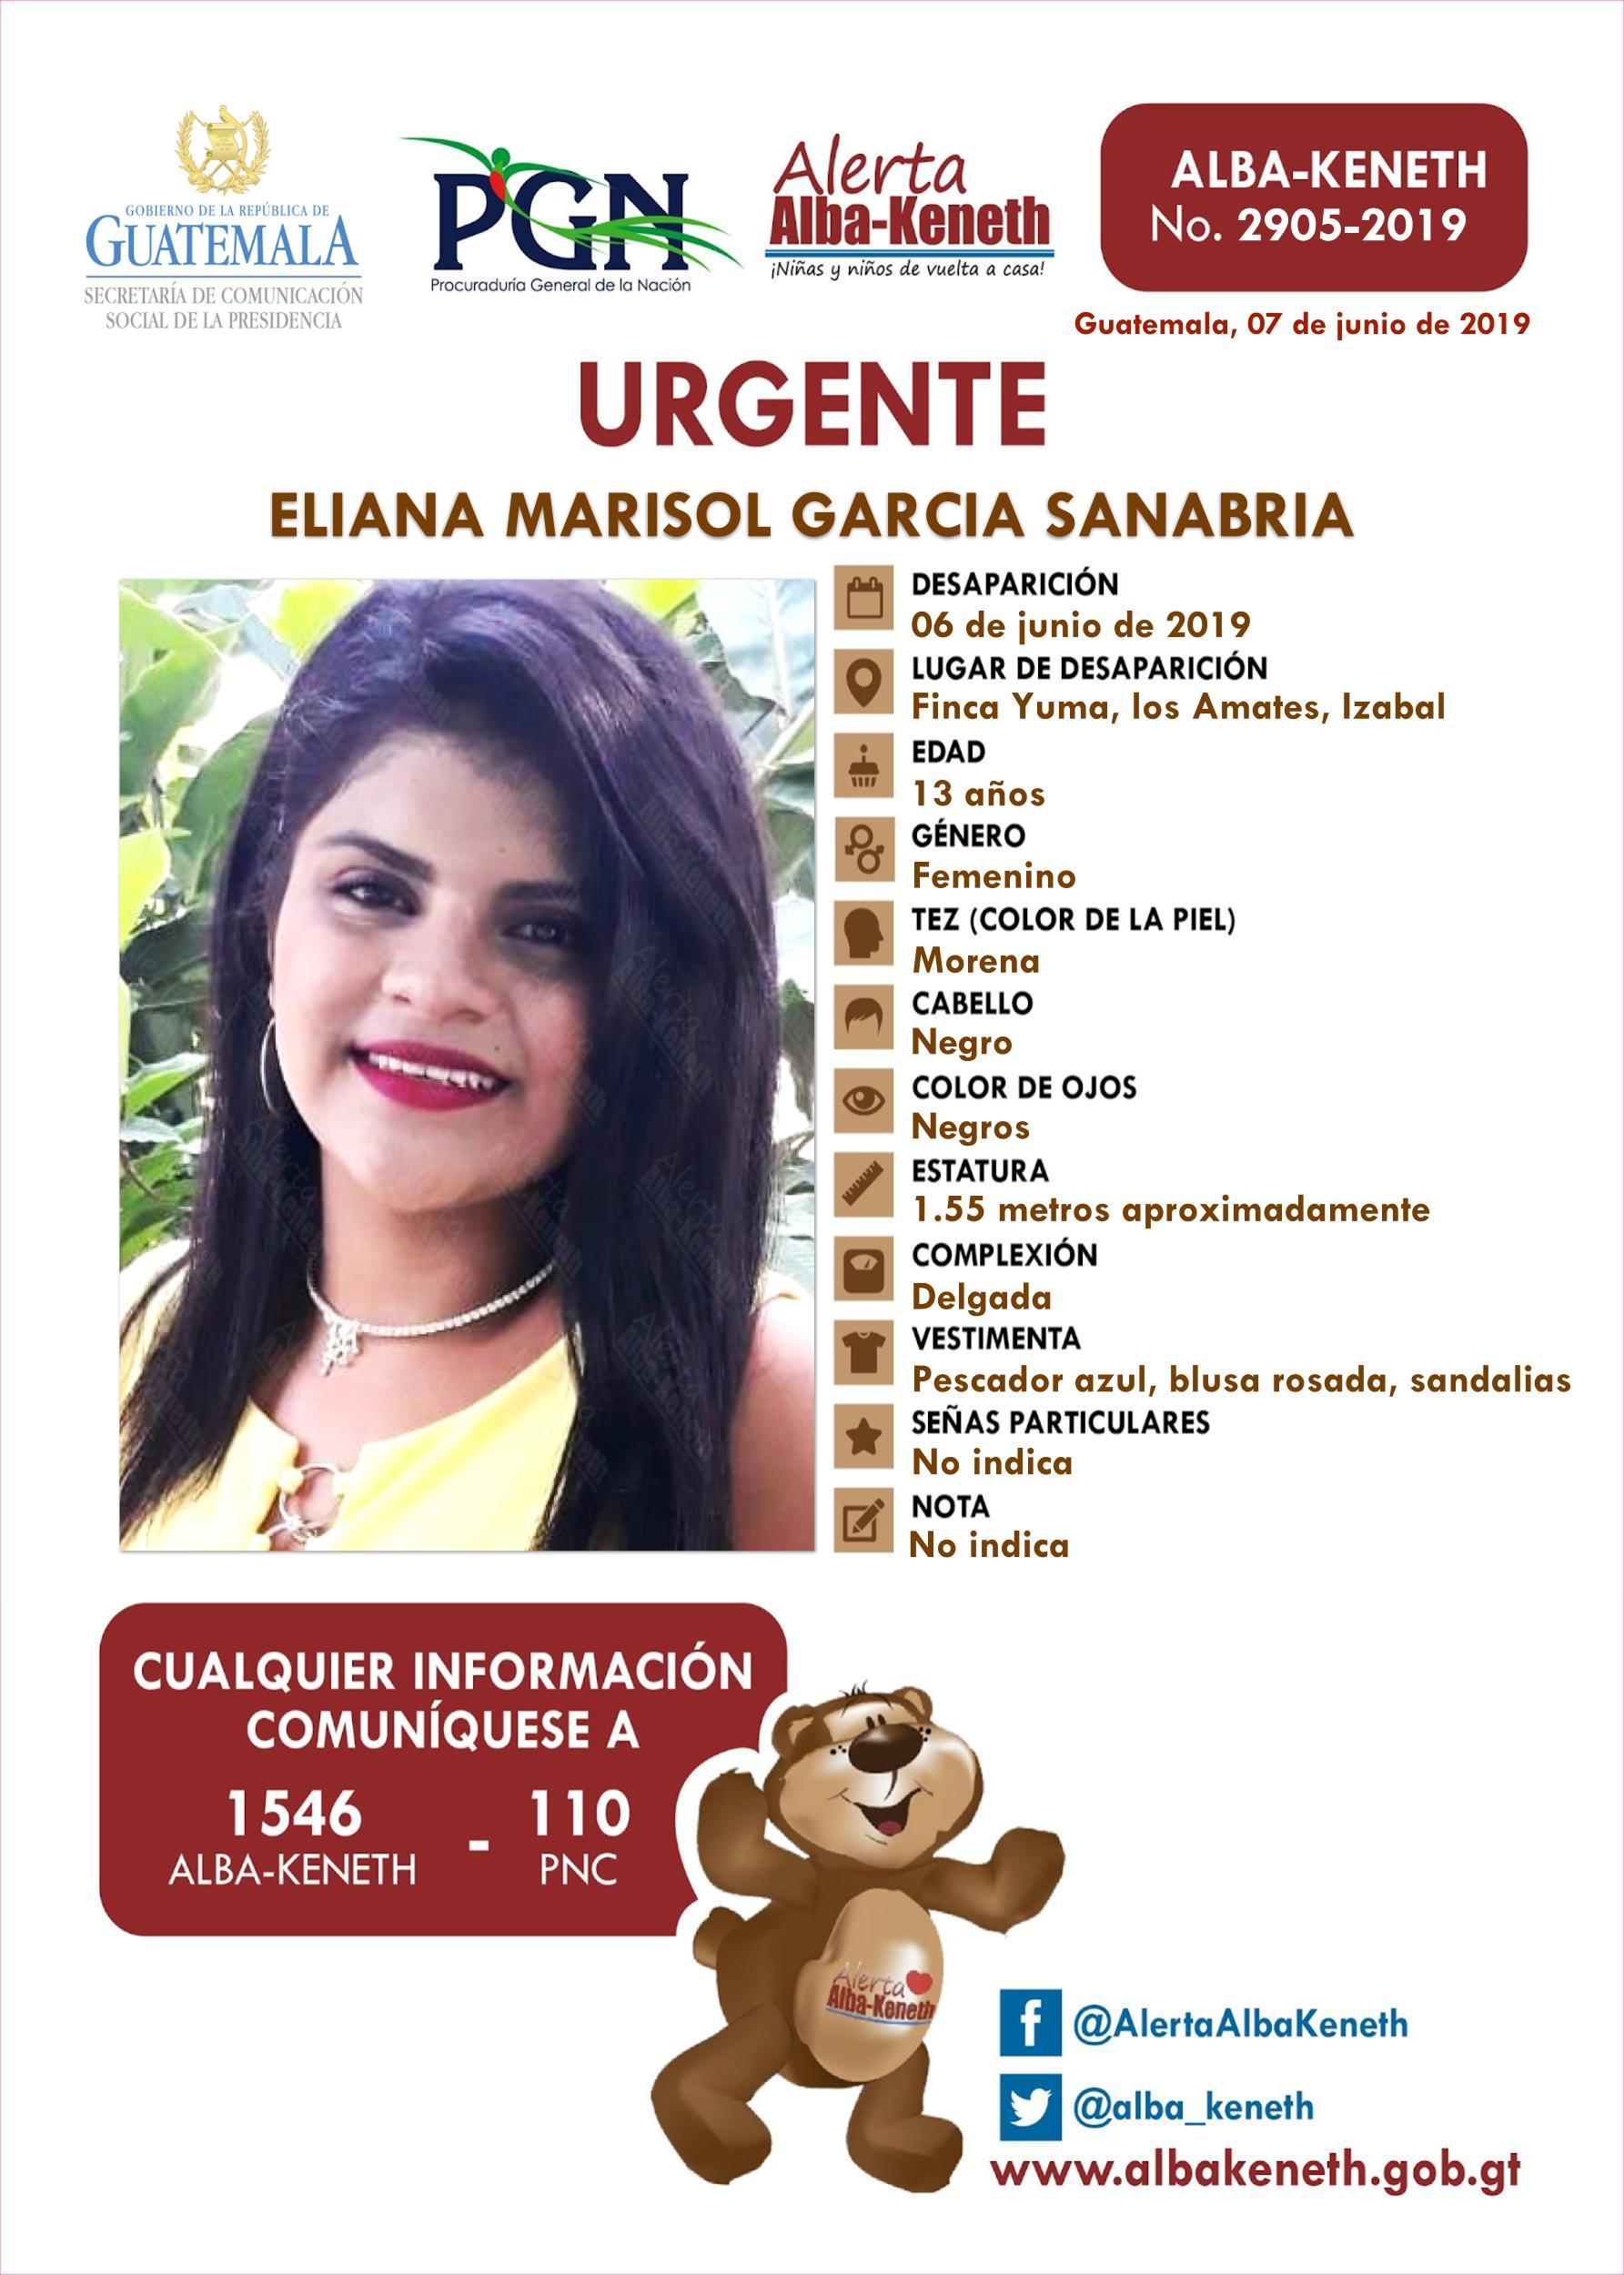 Eliana Marisol Garcia Sanabri